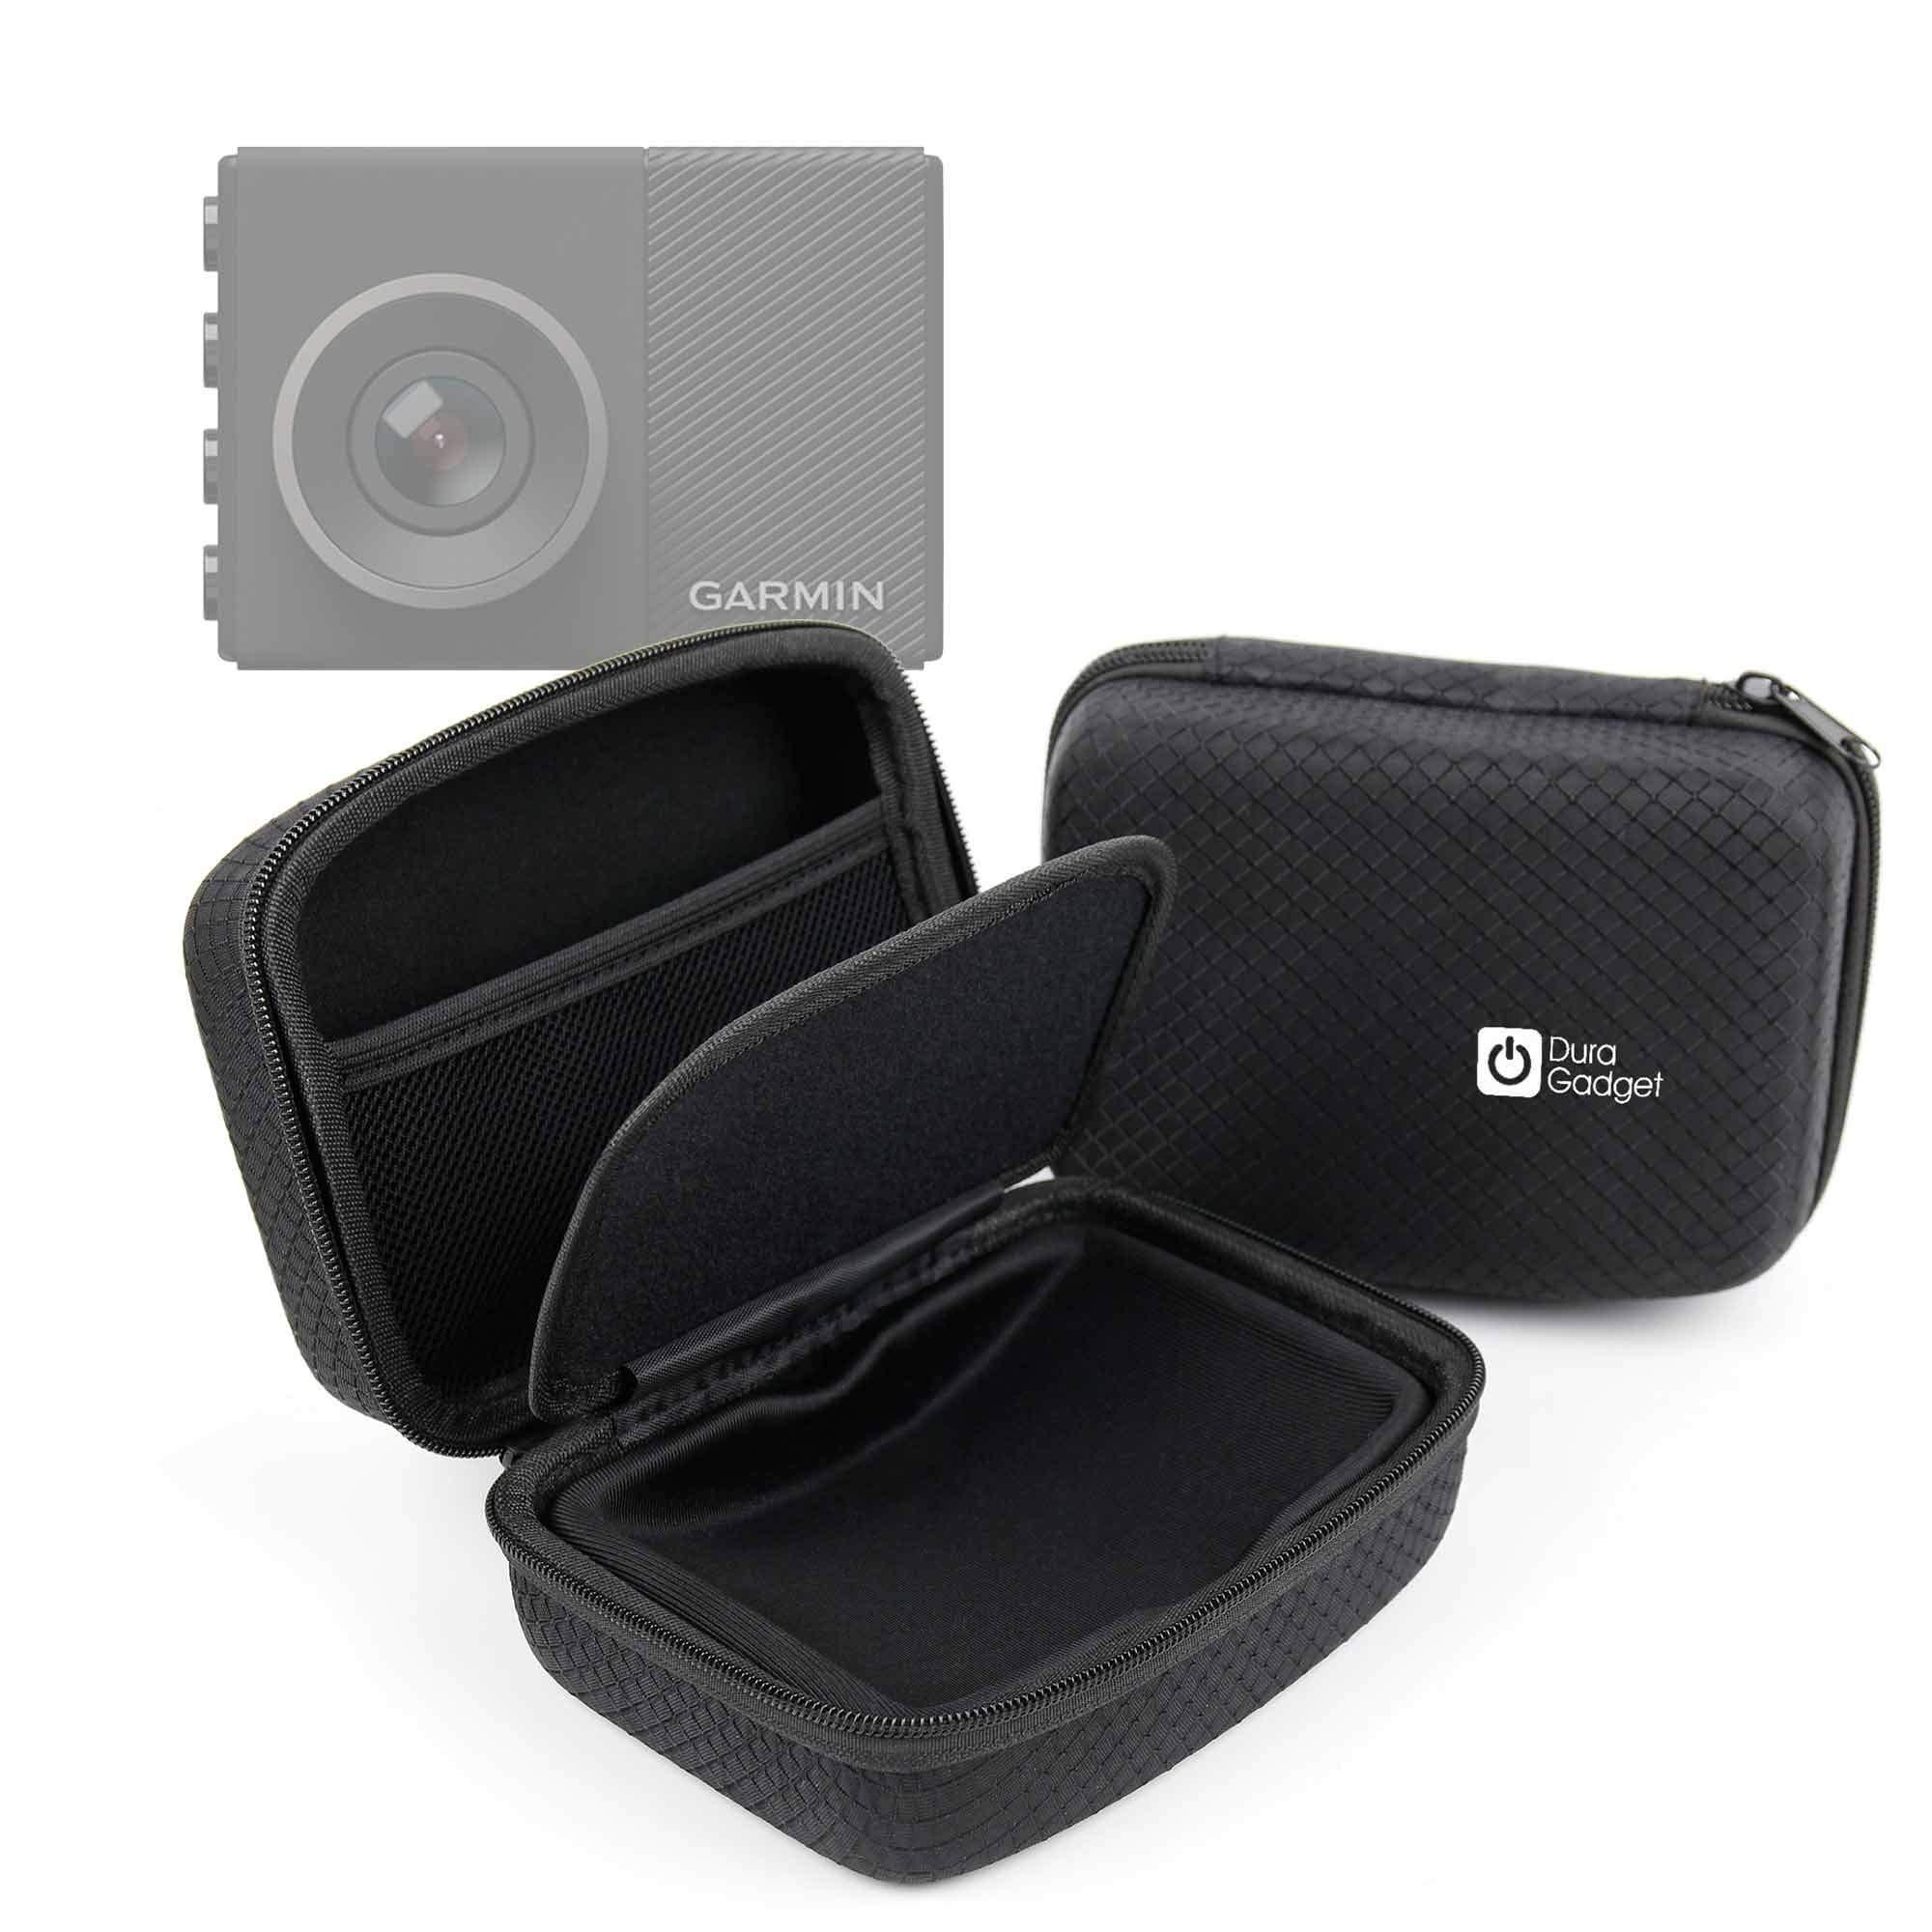 DURAGADGET Deluxe Hard EVA Box Case in Black - Compatible with The Garmin Dash Cam 65W | Garmin Dash Cam 45 | Garmin Dash Cam 55 | by DURAGADGET